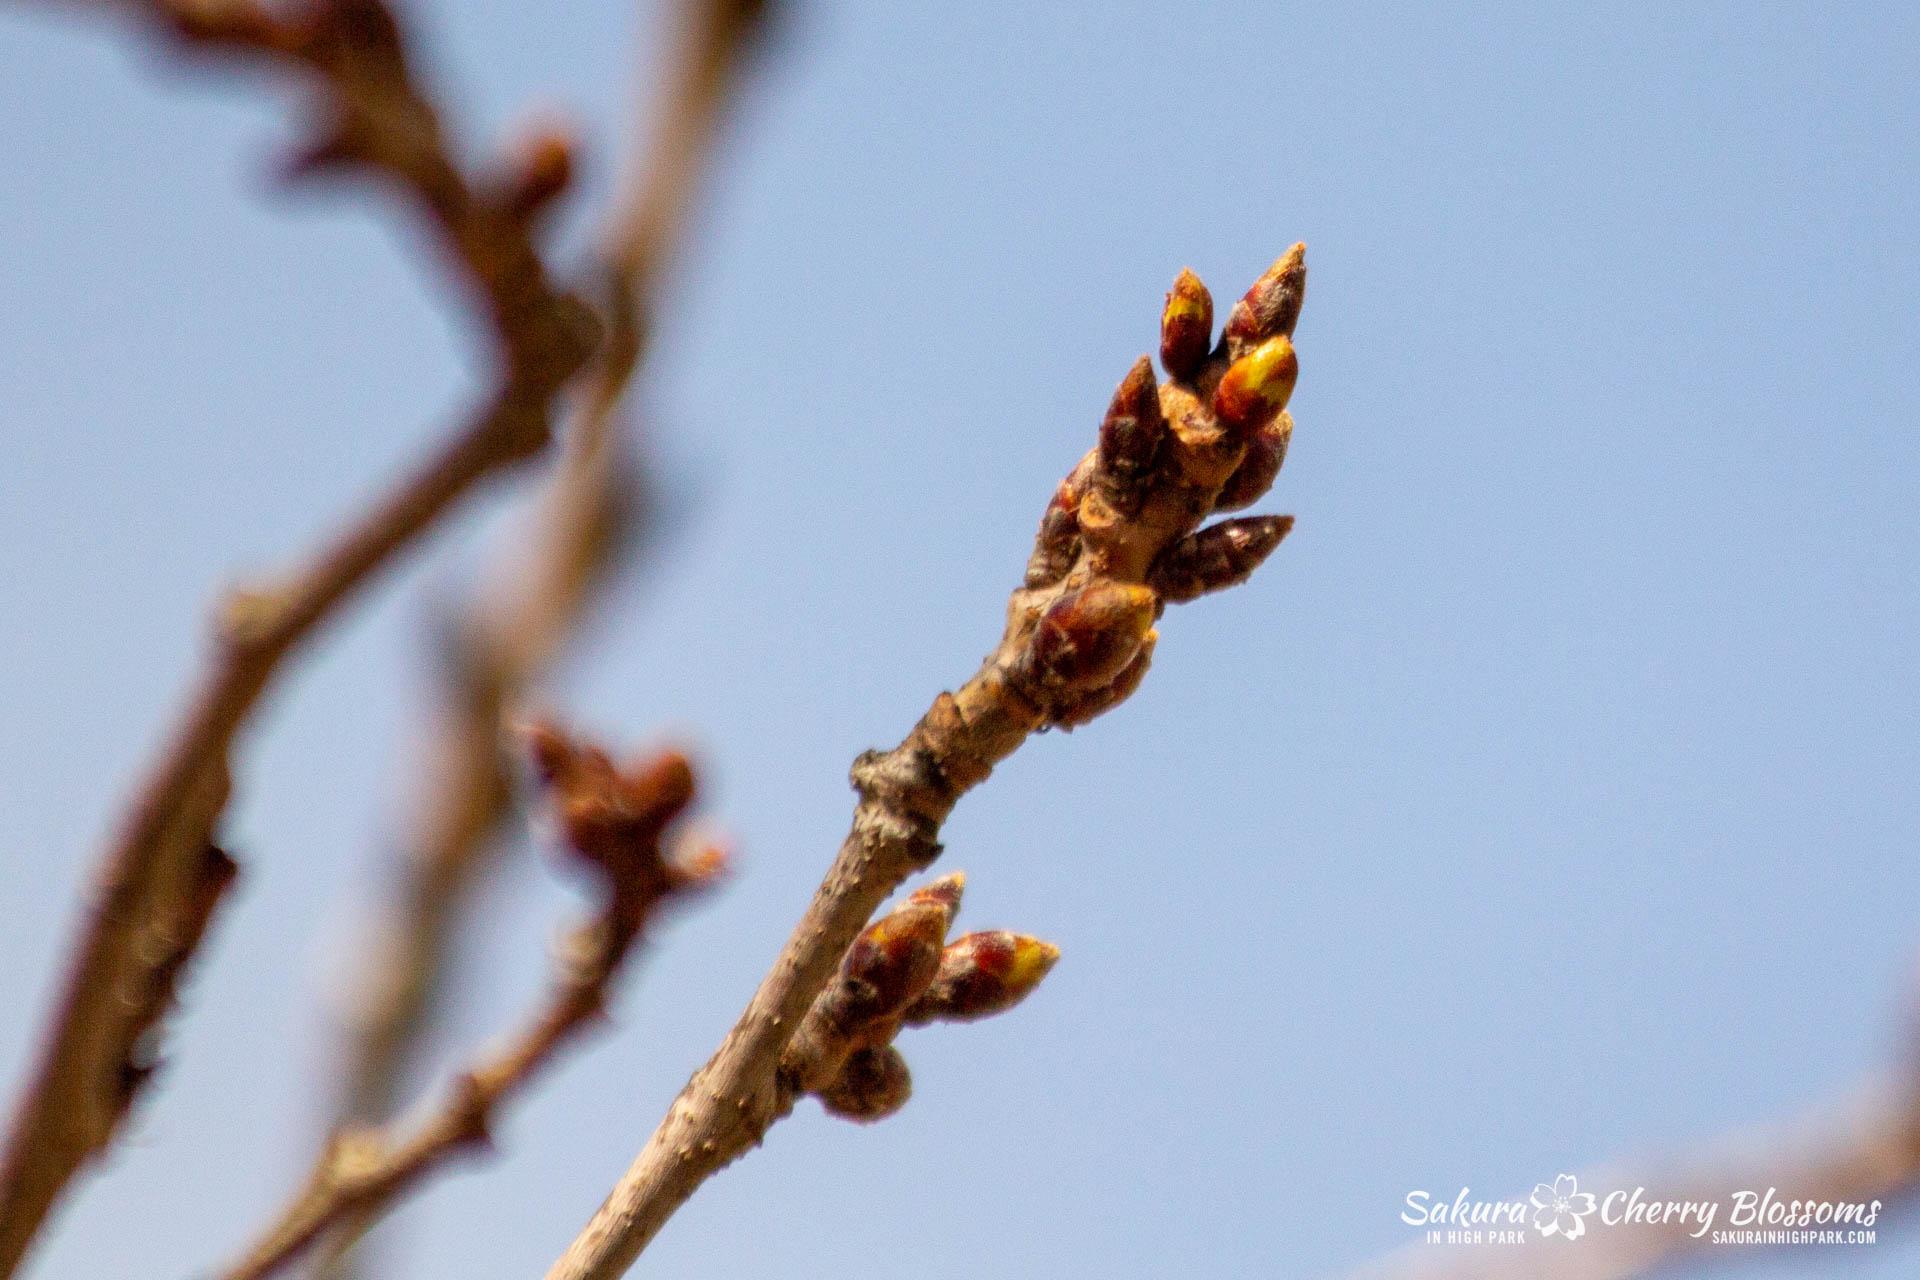 Sakura-Watch-April-5-2018-79.jpg